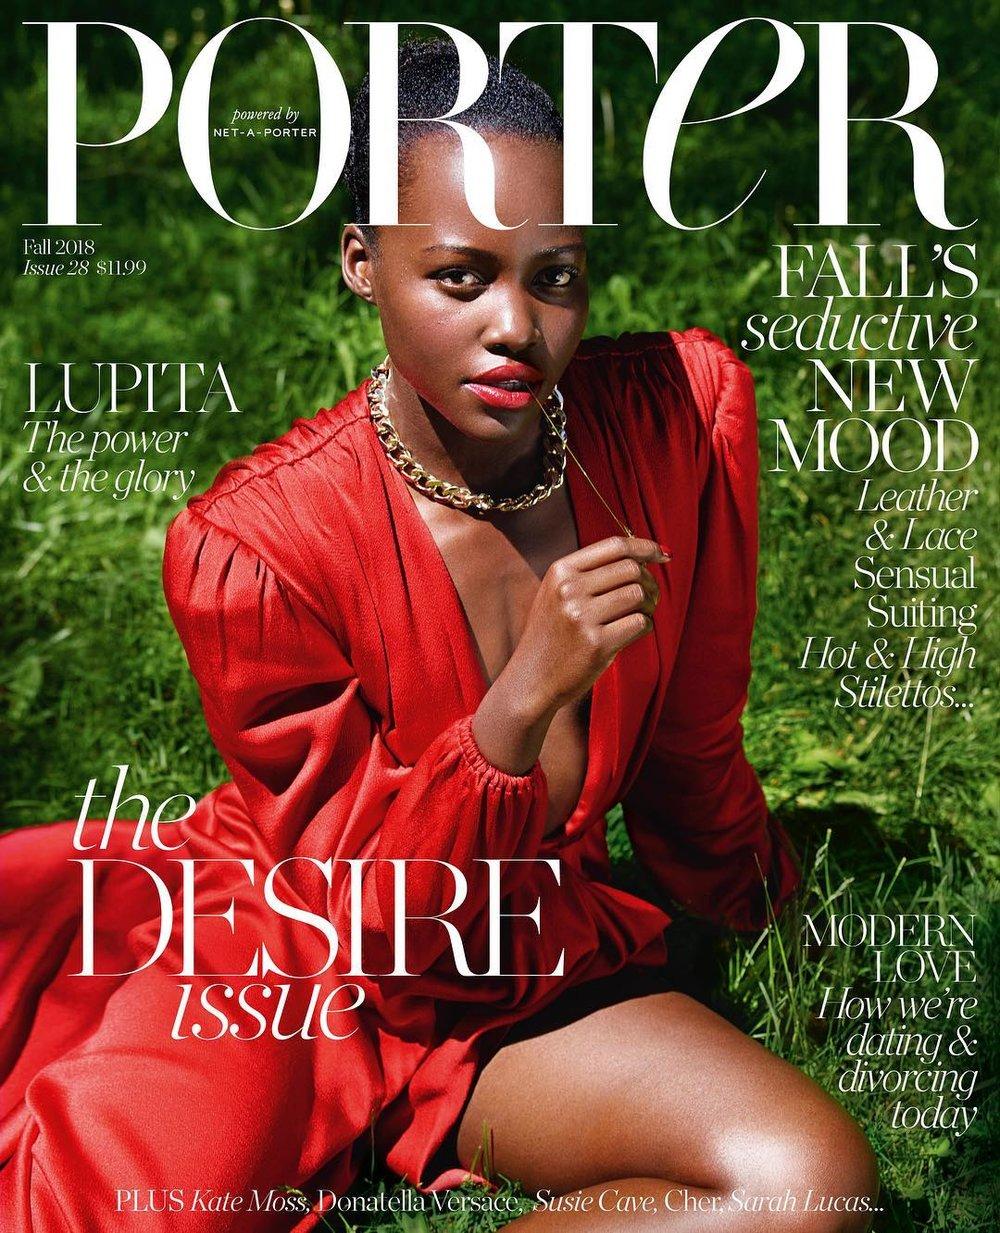 Lupita Nyong'o by Mario Sorrenti for Porter 28 Fall 2018 (14).jpg